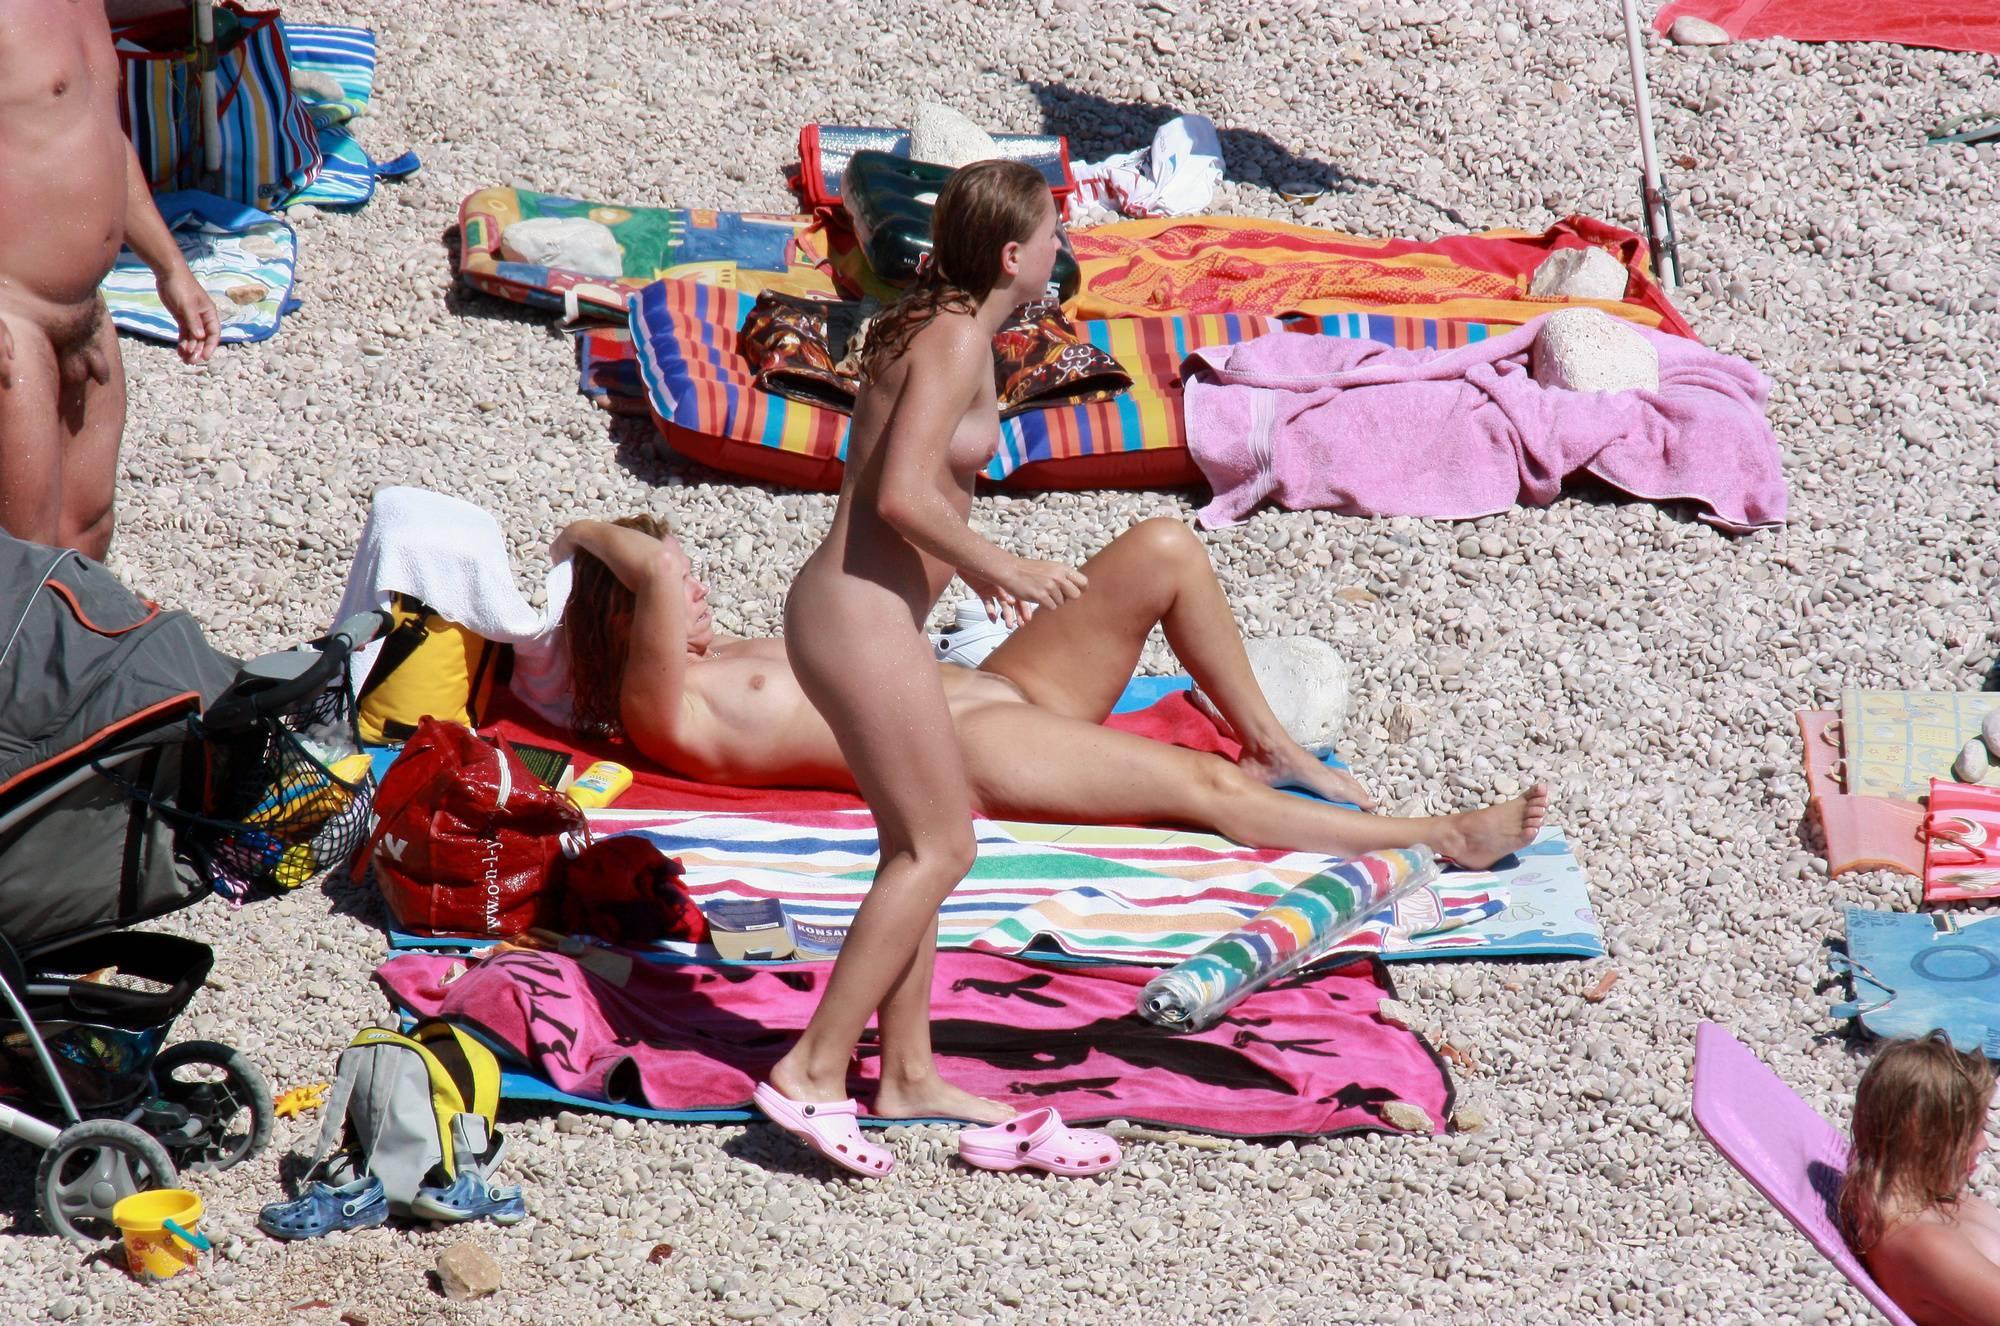 Nudist Photos Nudist Family With Crocs - 2